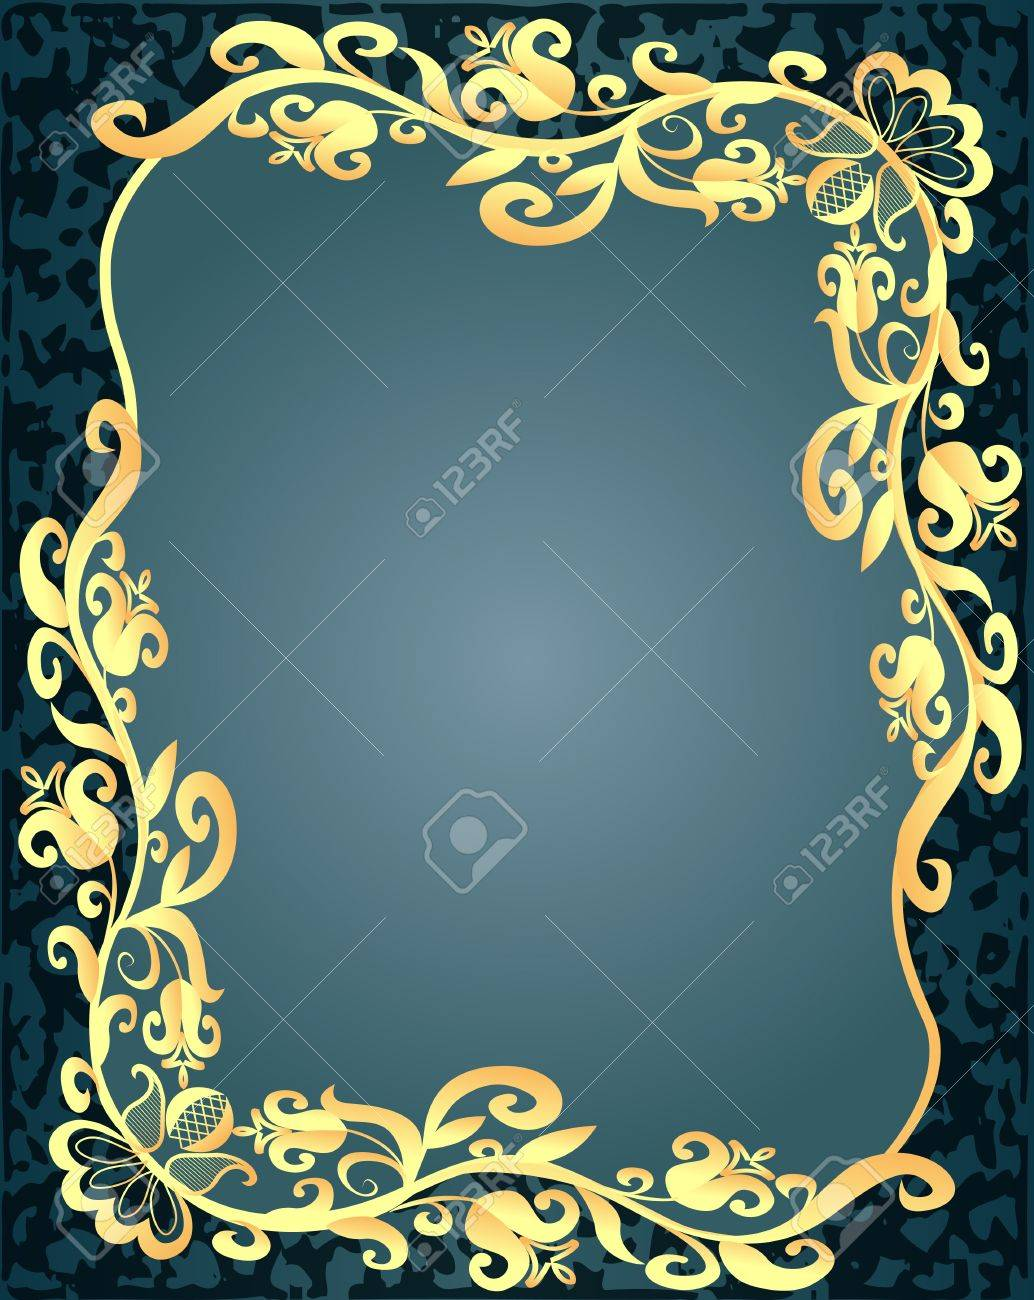 illustration spotted background frame with vegetable gold(en) pattern Stock Vector - 13550074